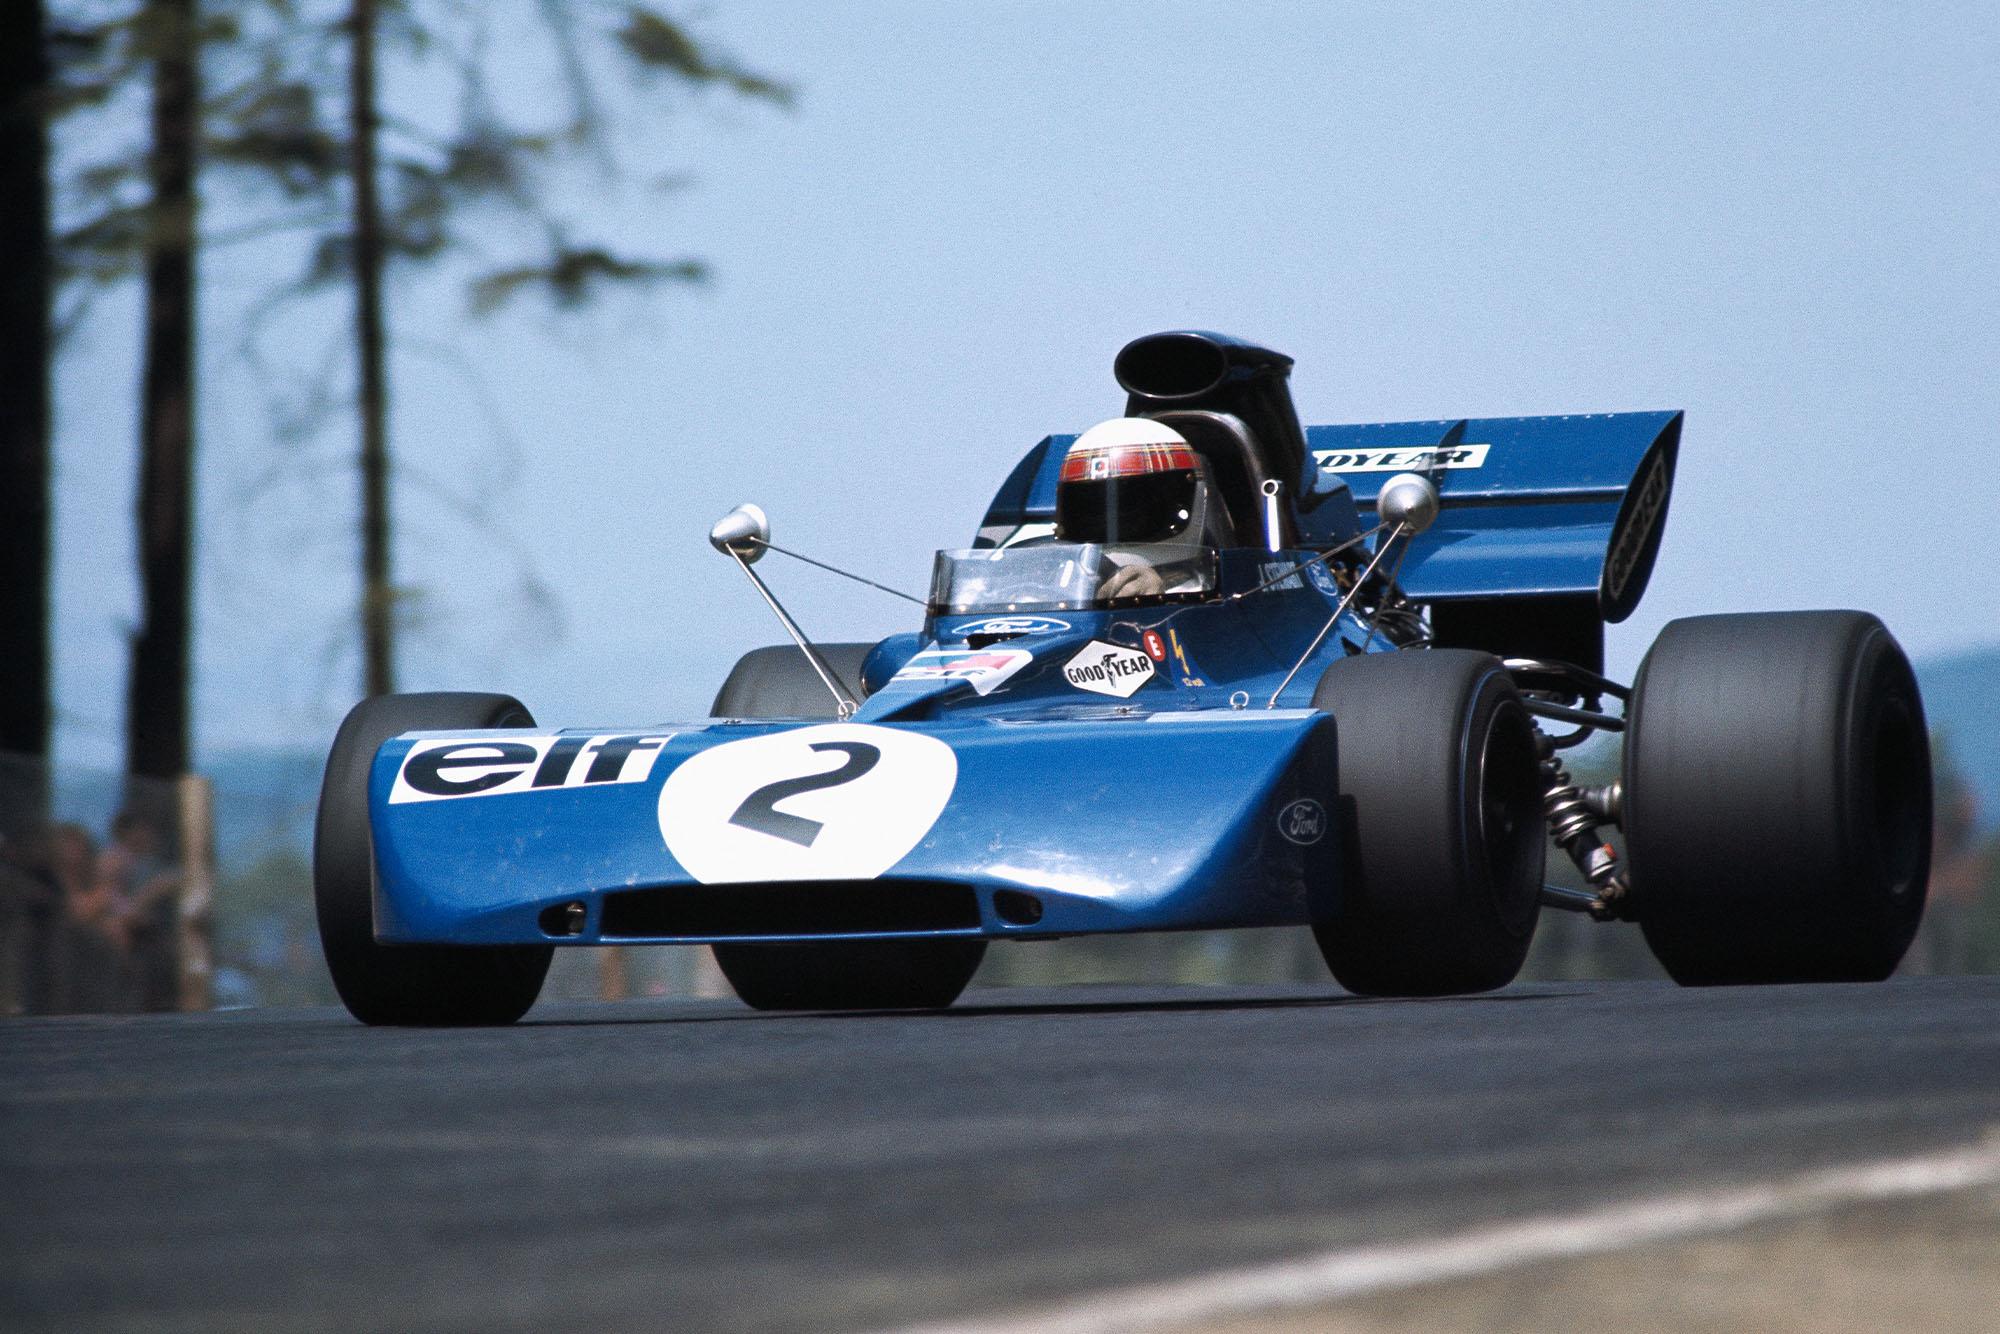 Jackie Stewart takes off through the Flugplatz on his way to winning the 1971 German Grand Prix.